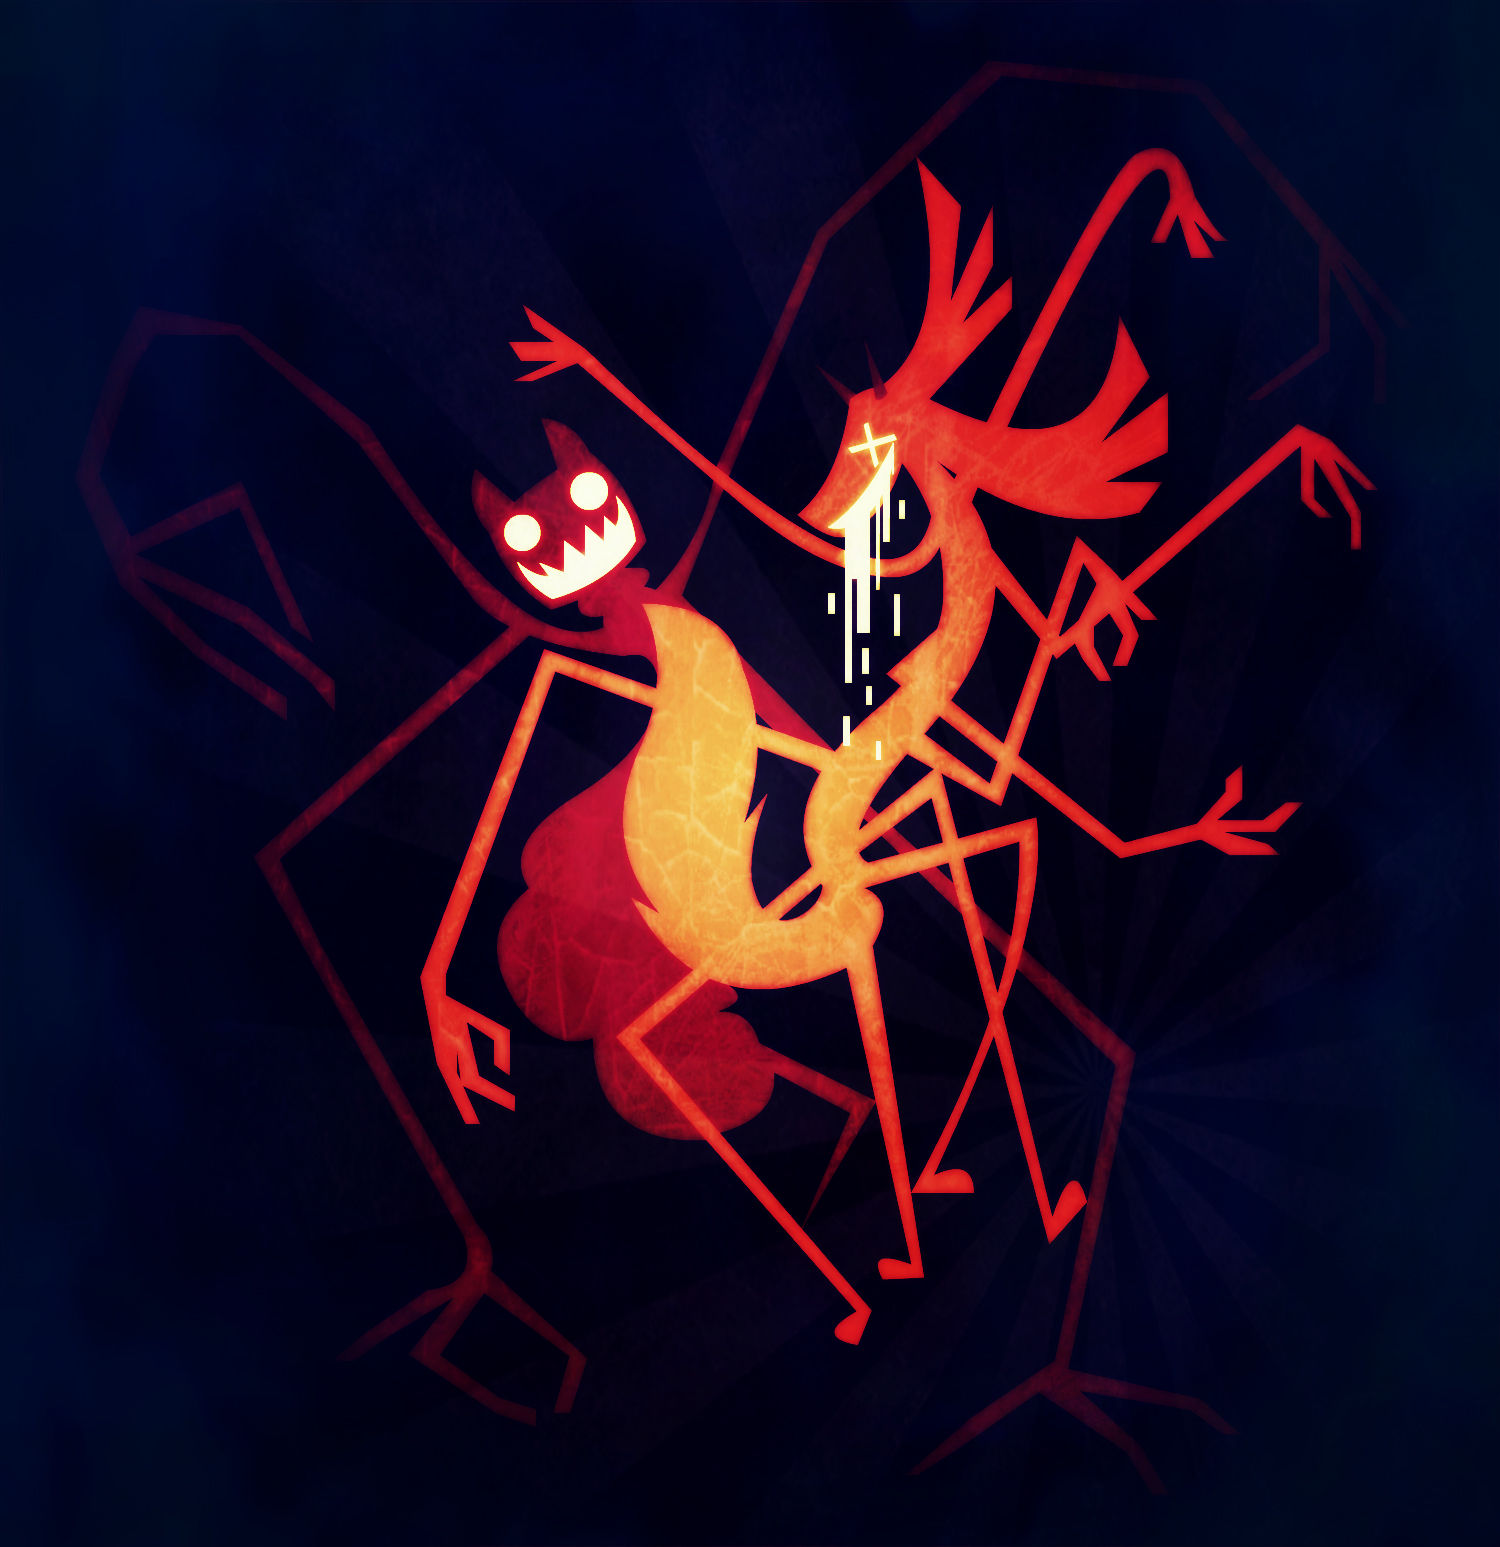 Ghostinael